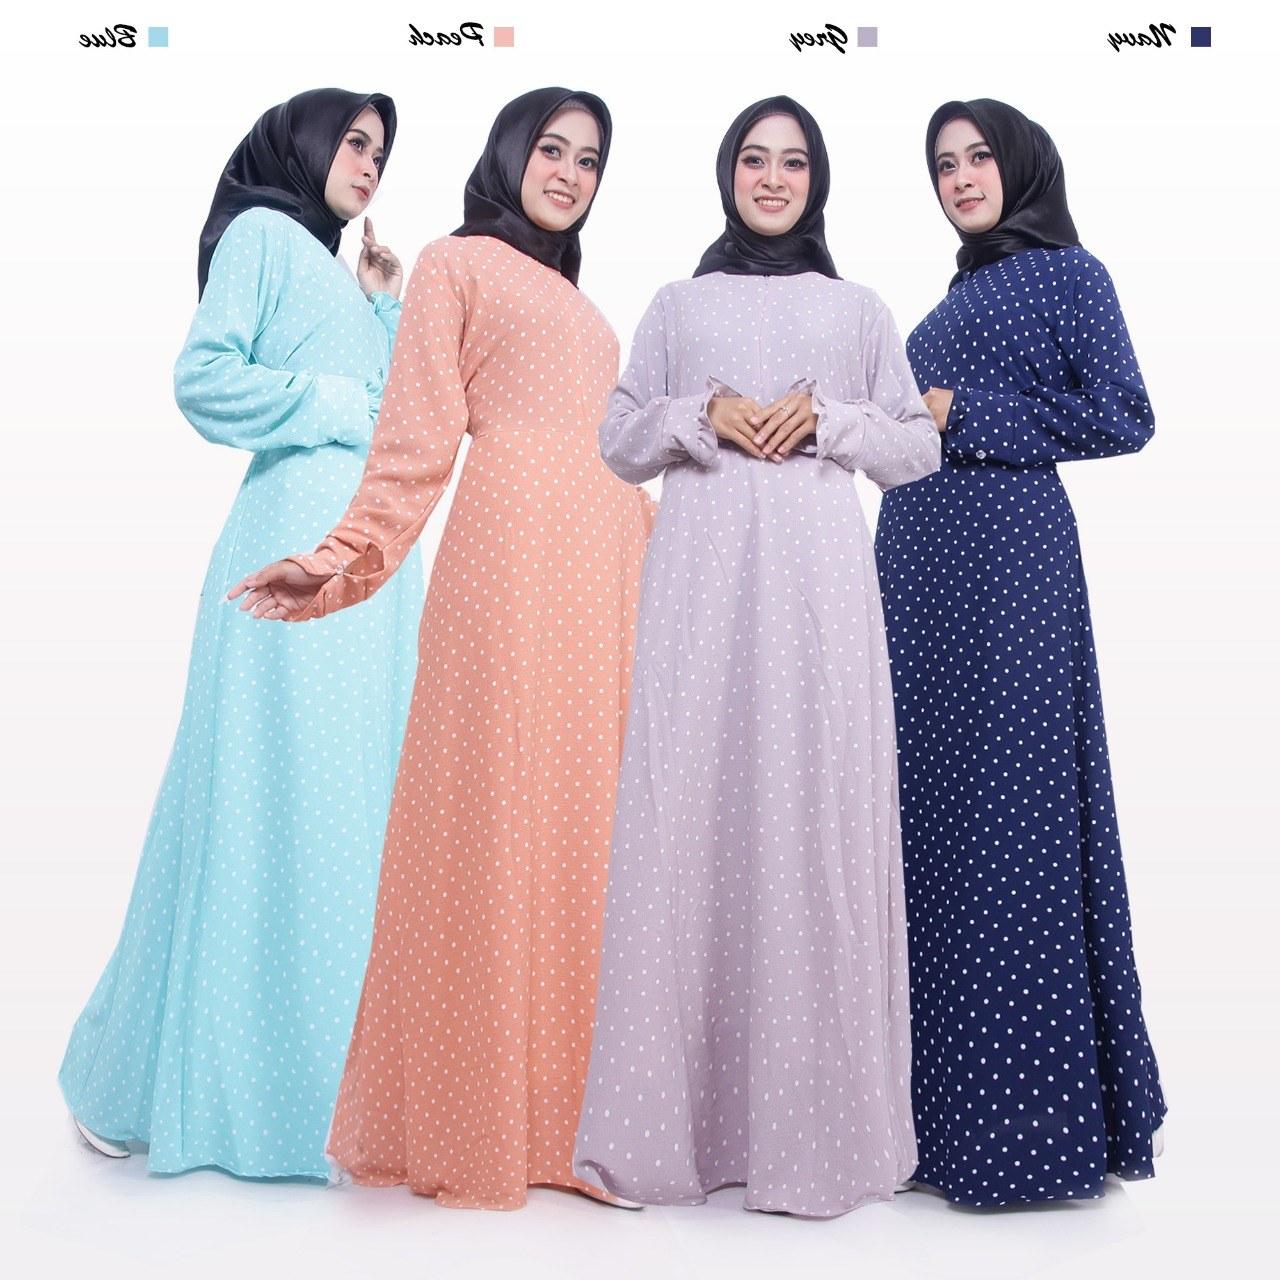 Model Baju Lebaran Tanah Abang 2018 S5d8 Jual Baju Gamis Tanpa Khimar Bahan Bubble Pop Motif